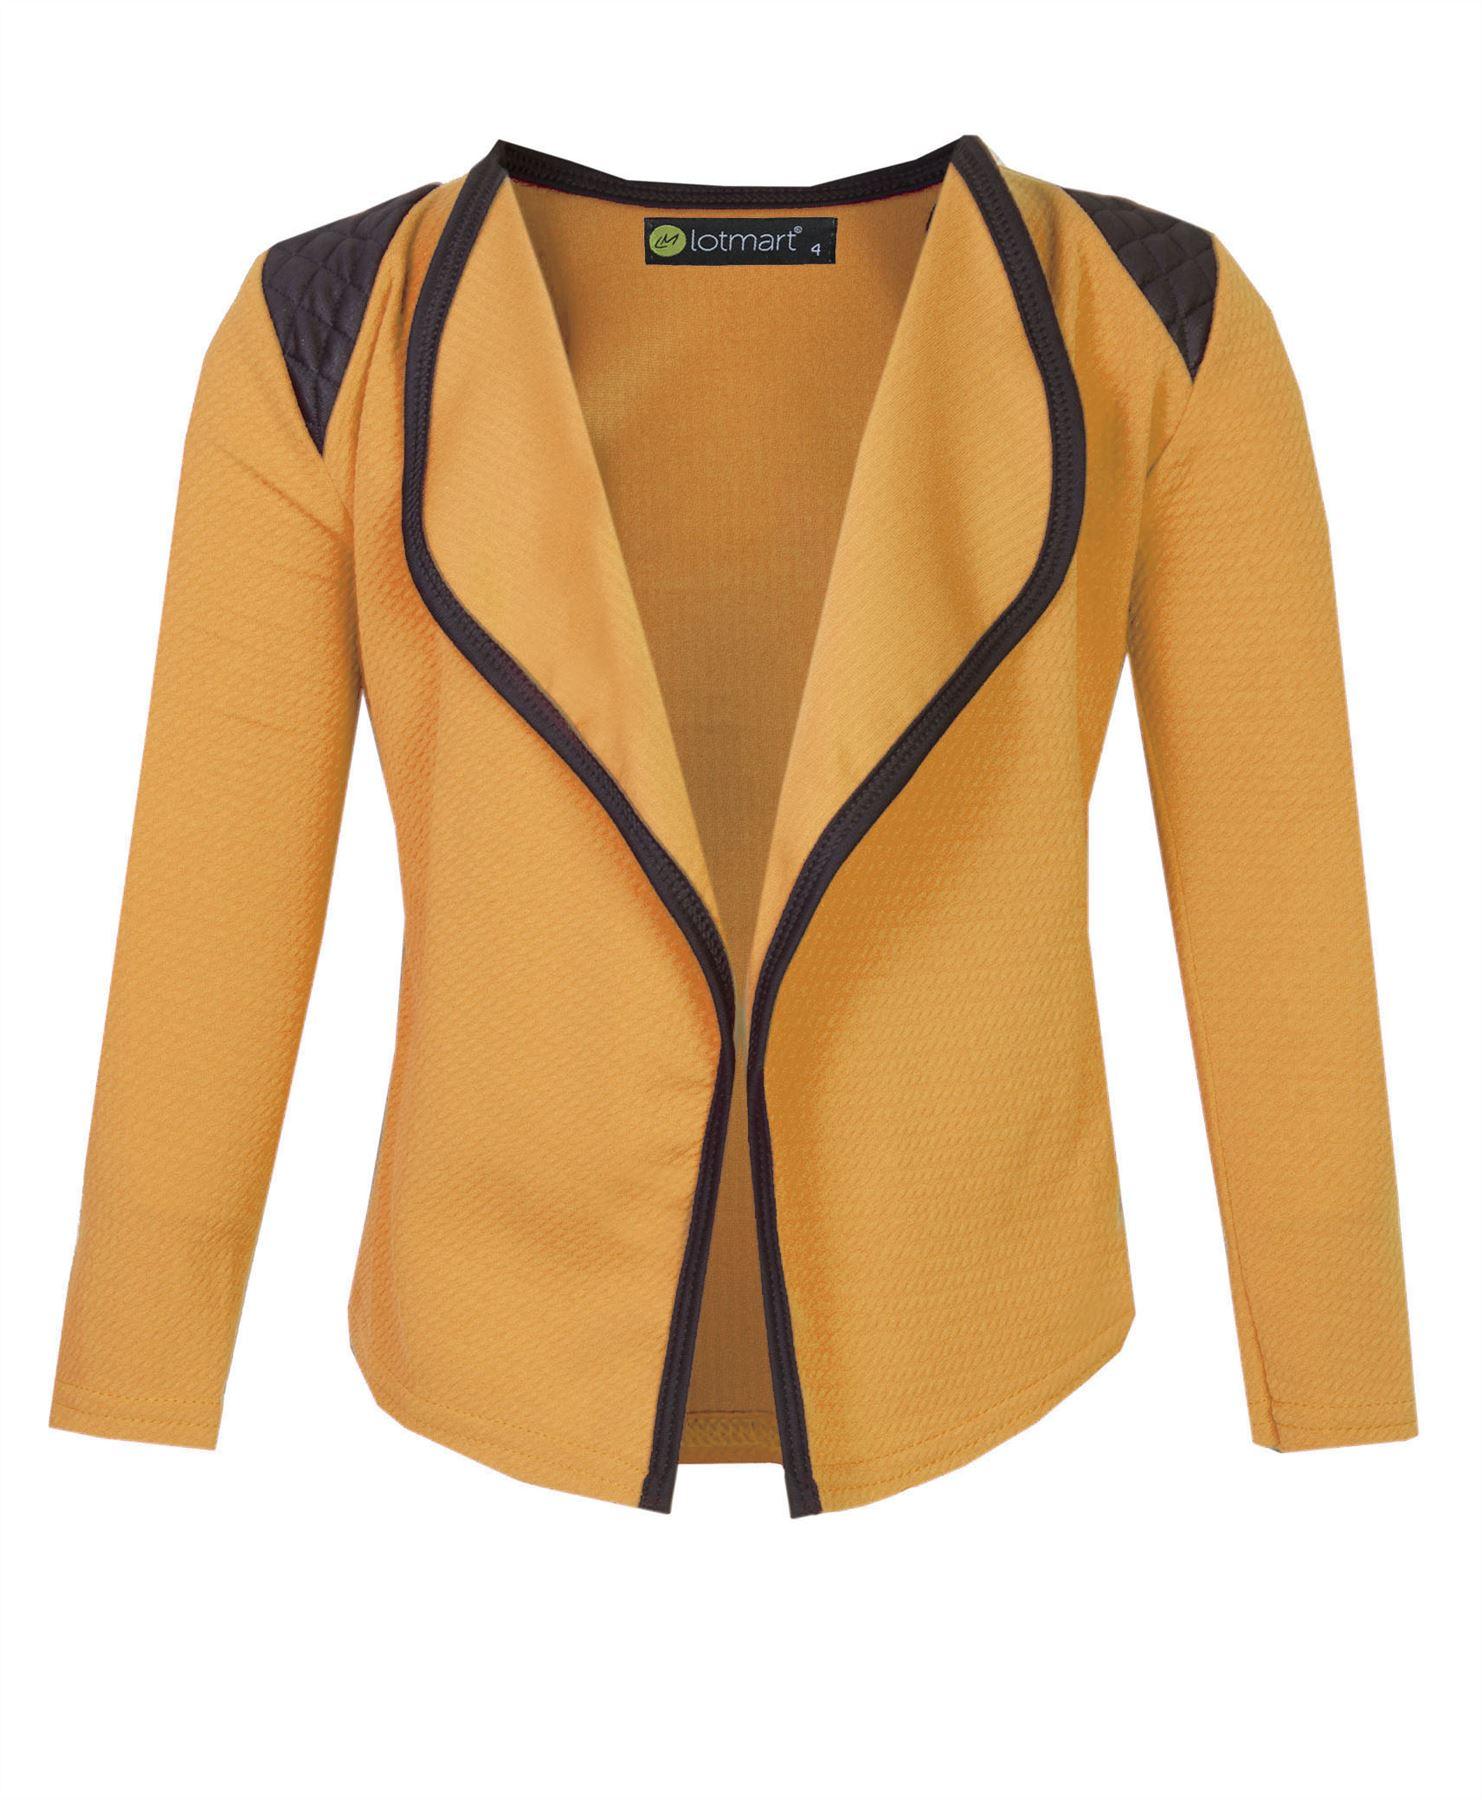 Girls Open Front Jacket Kids Long Sleeve Quilted Shoulder Cardigan Top 3-14 Y